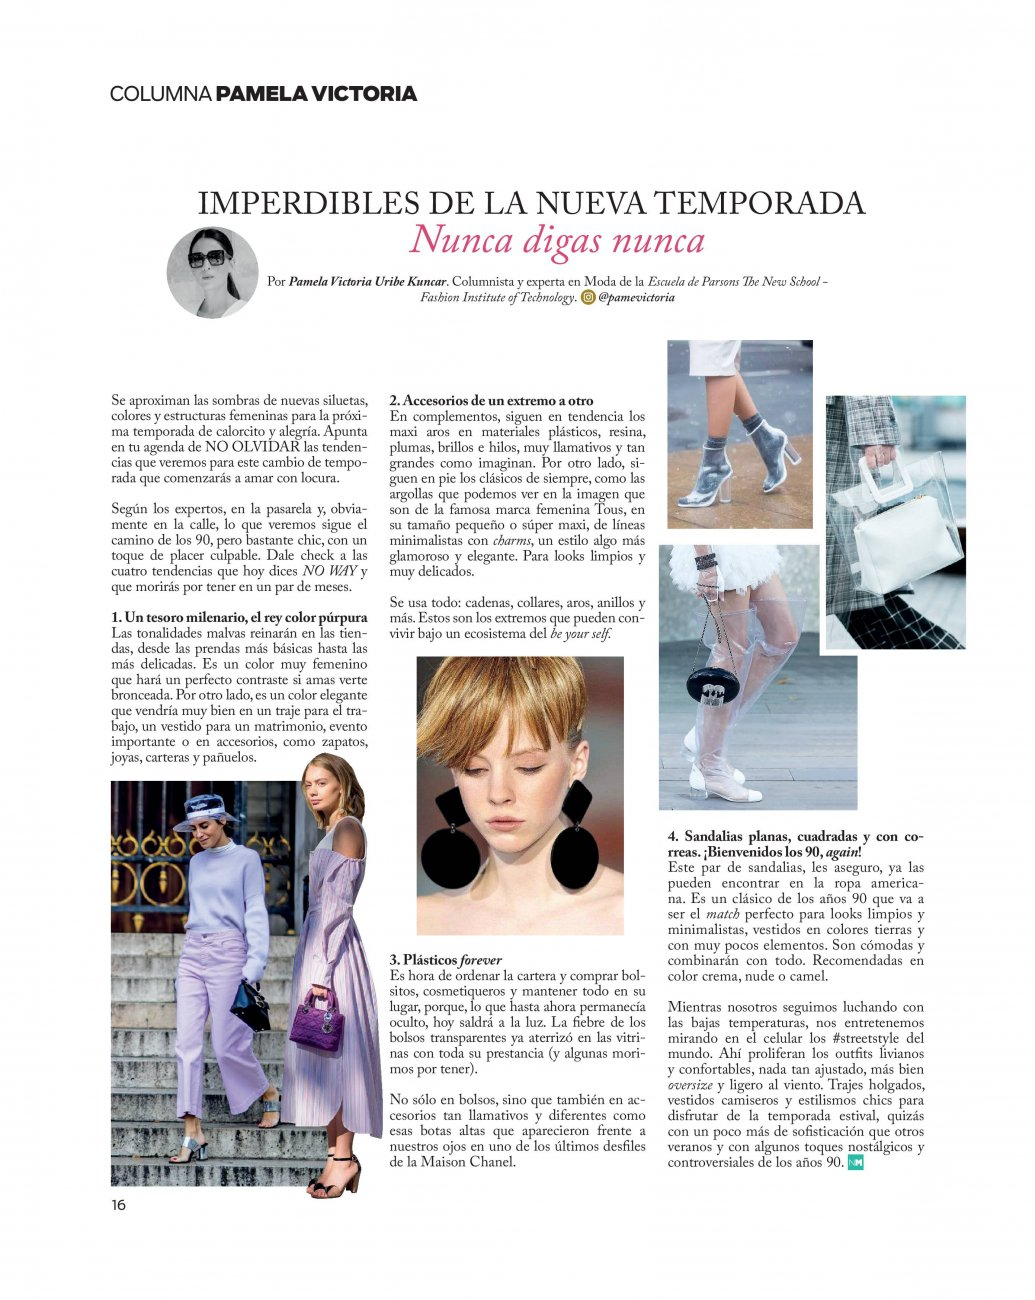 pamela victoria experta en moda en chile - pamela victoria columnista especialista de moda en chile